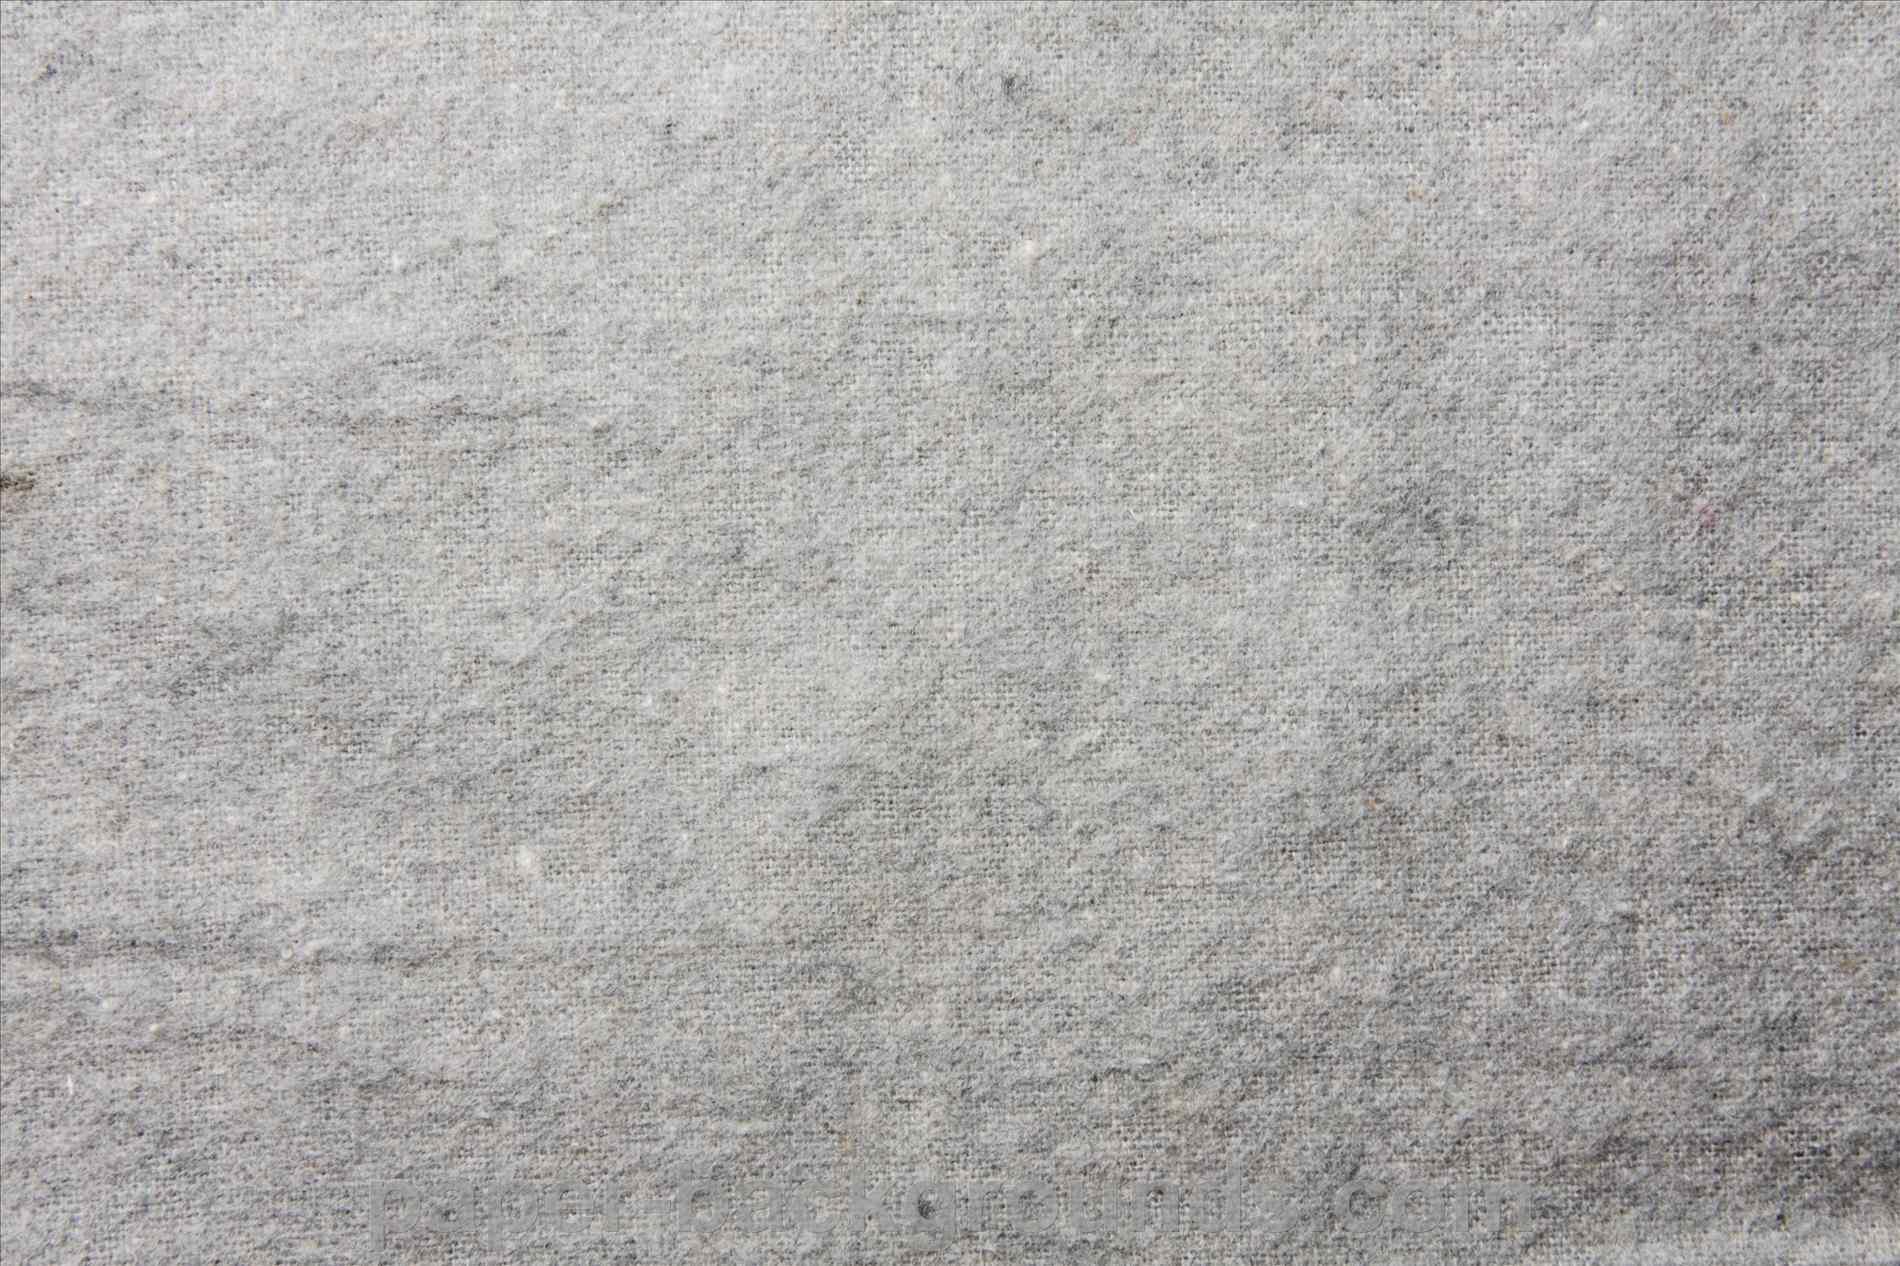 blanket : Soft Blanket Texture blankets